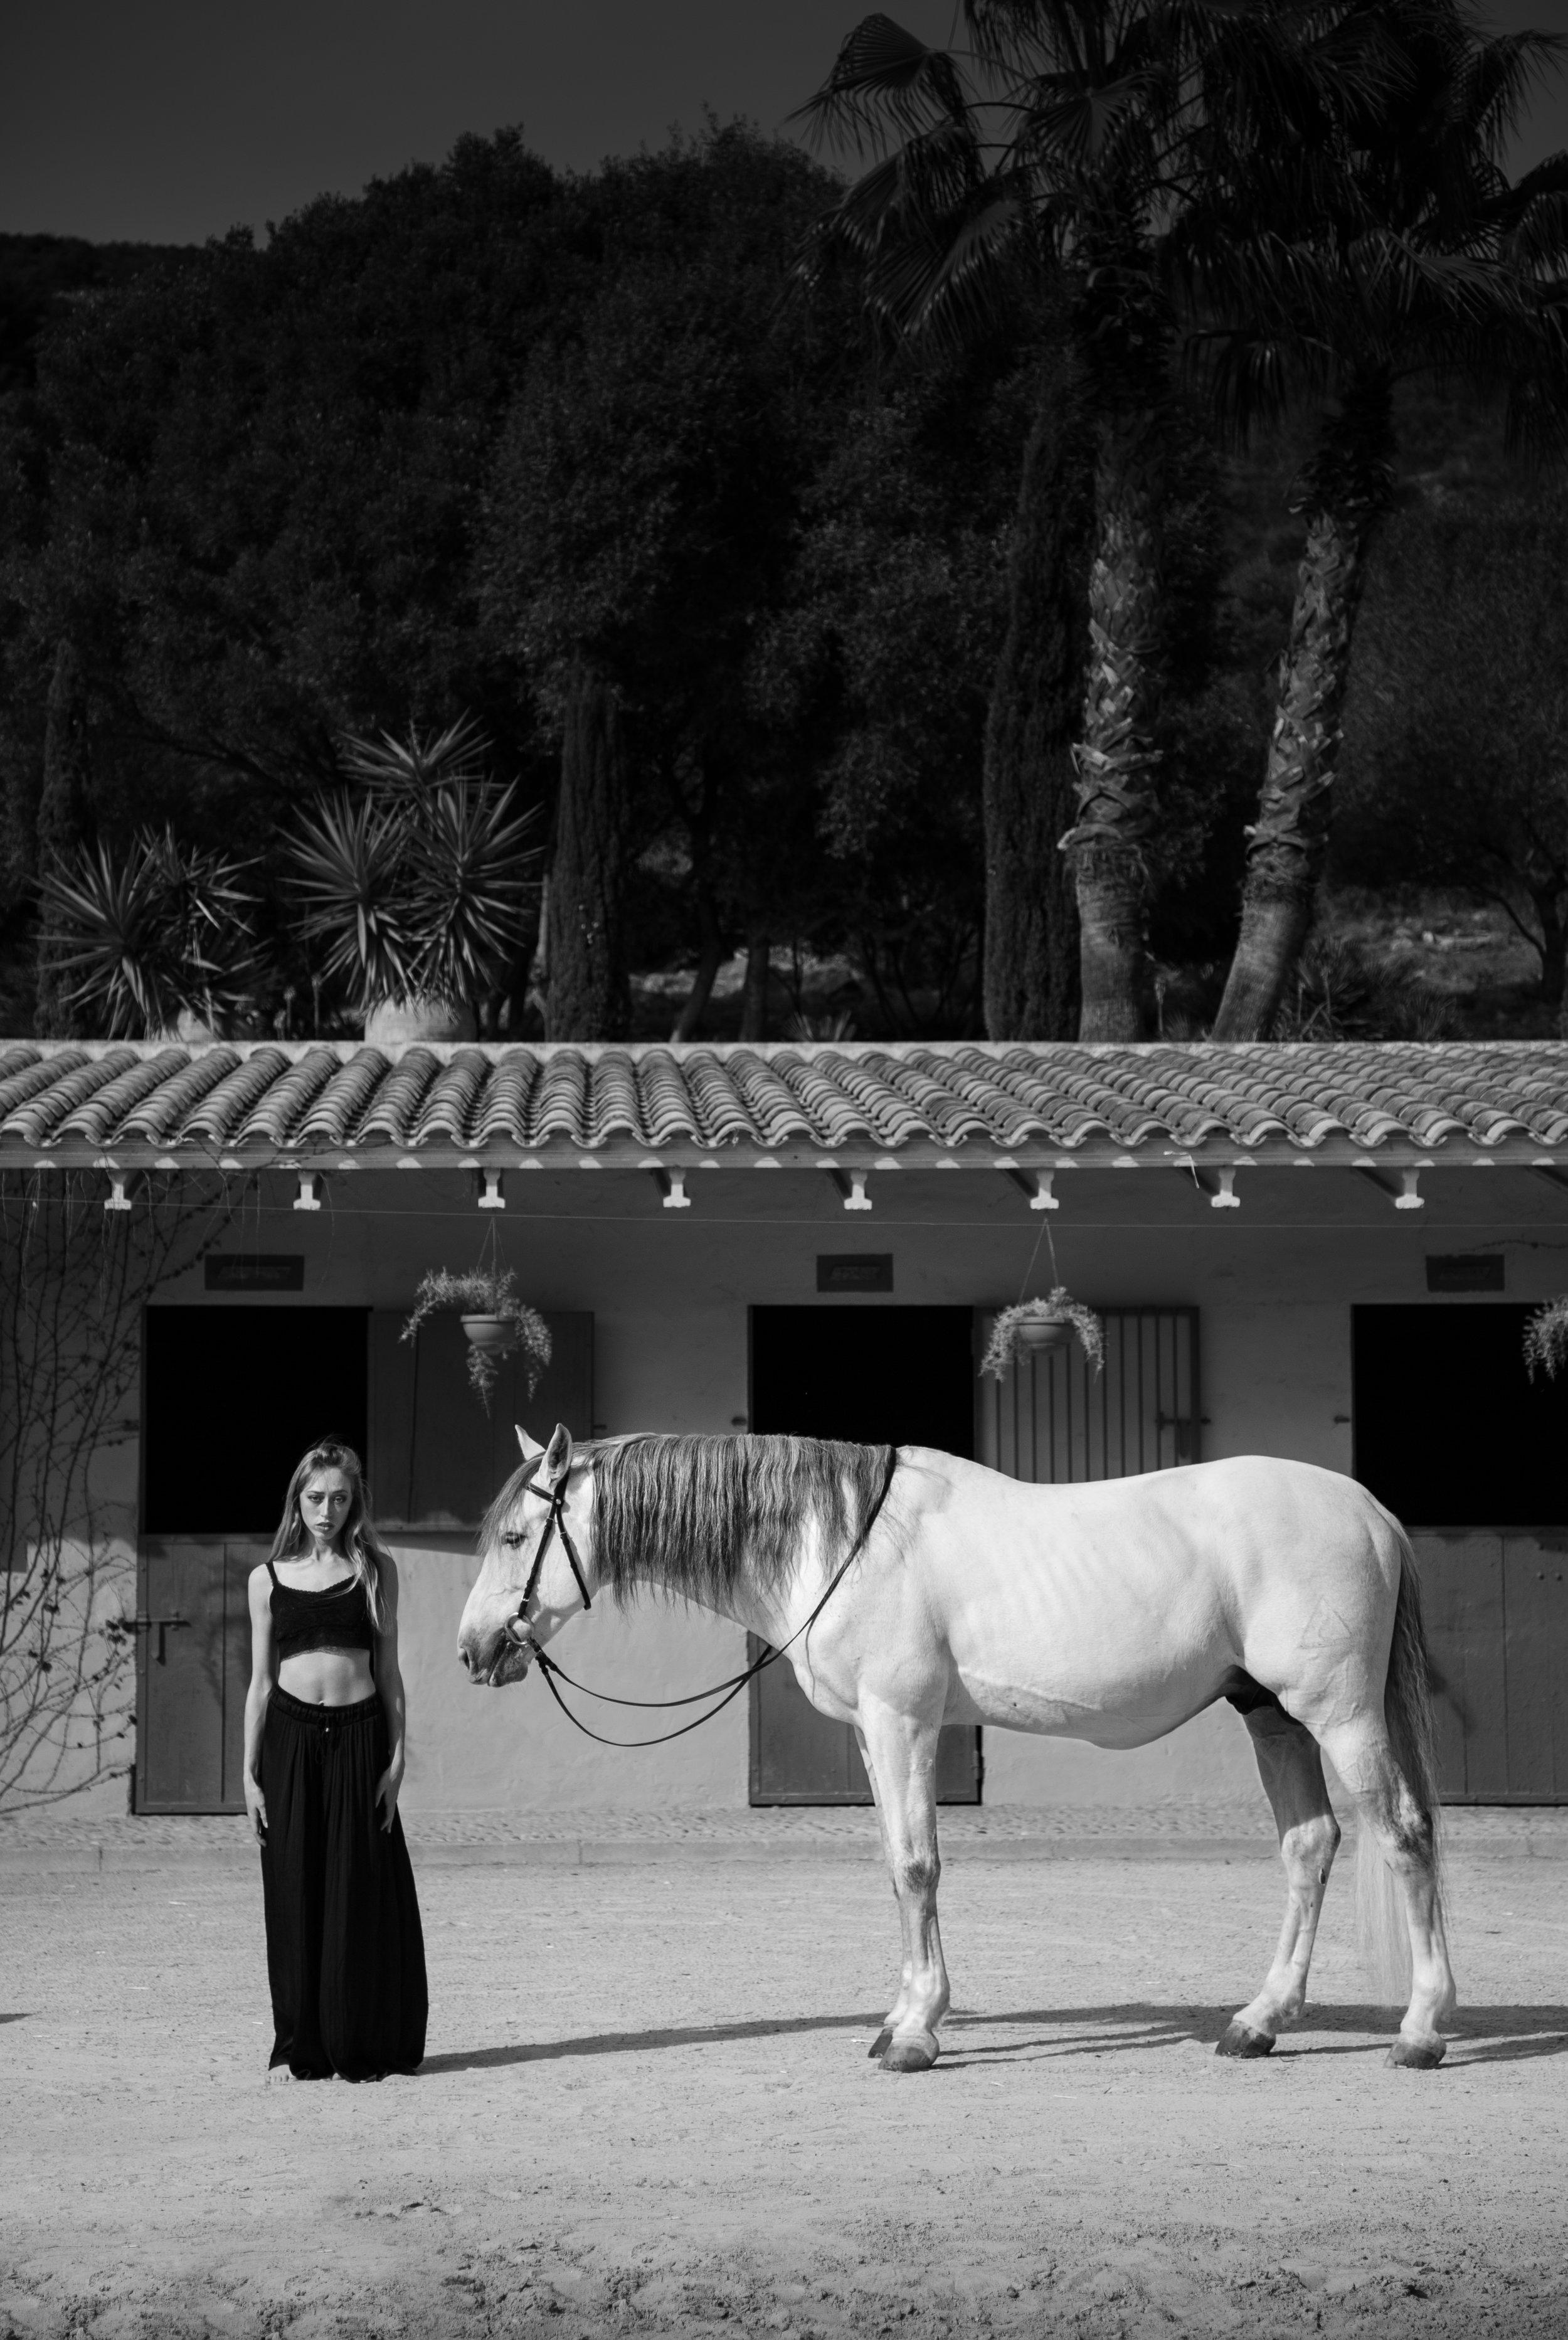 Helene_HorseEditorial_2019_1-4.JPG